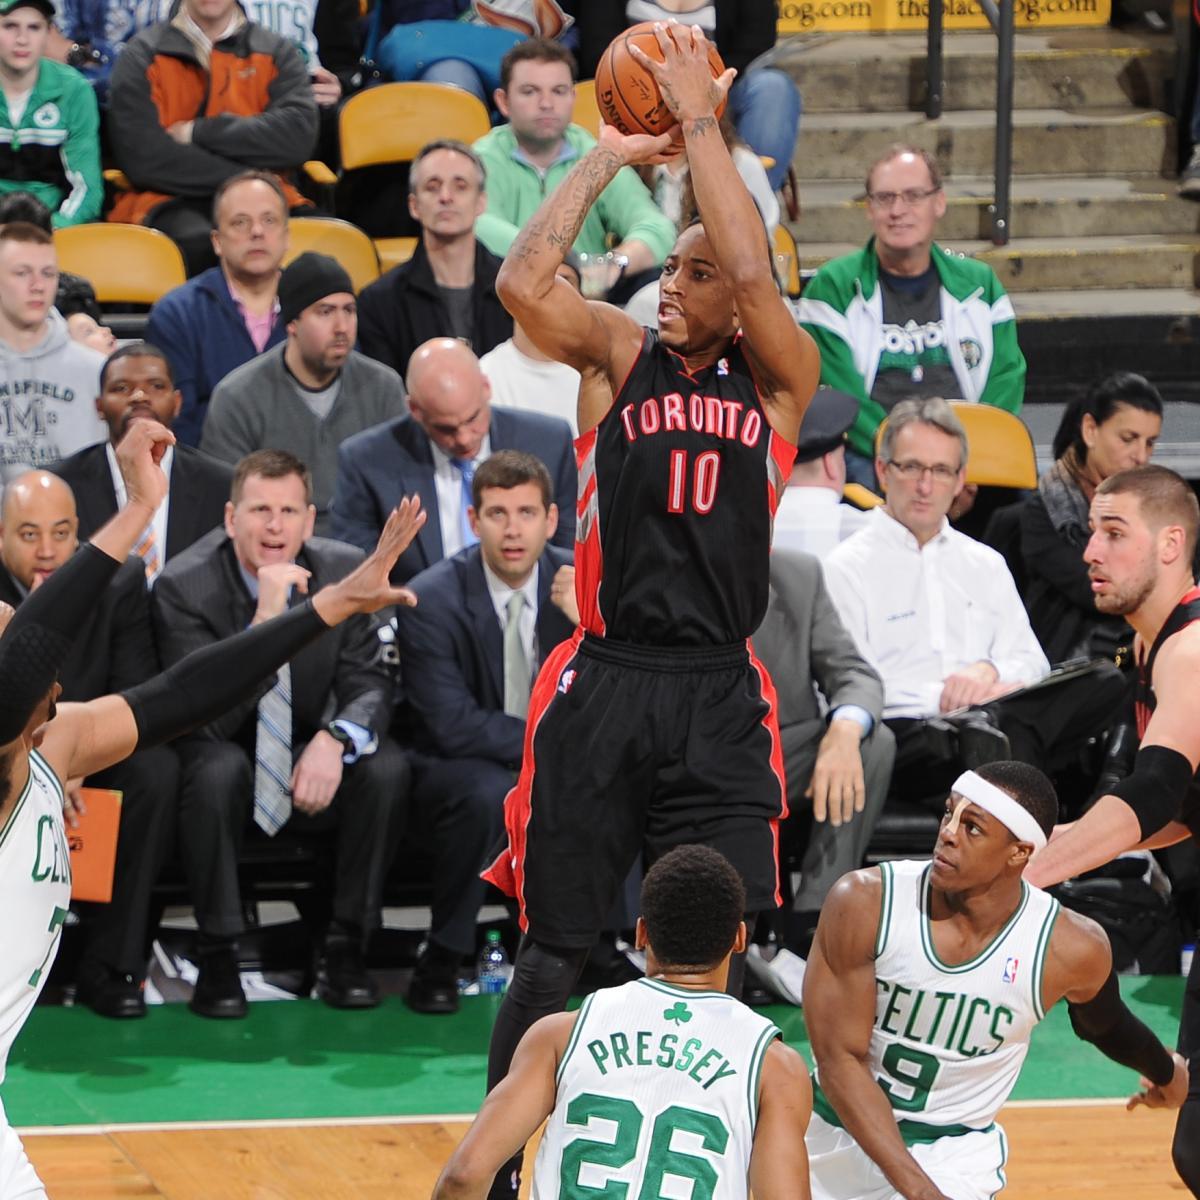 Boston Celtics Vs Toronto Raptors Live Score And Analysis Bleacher Report Latest News Videos And Highlights